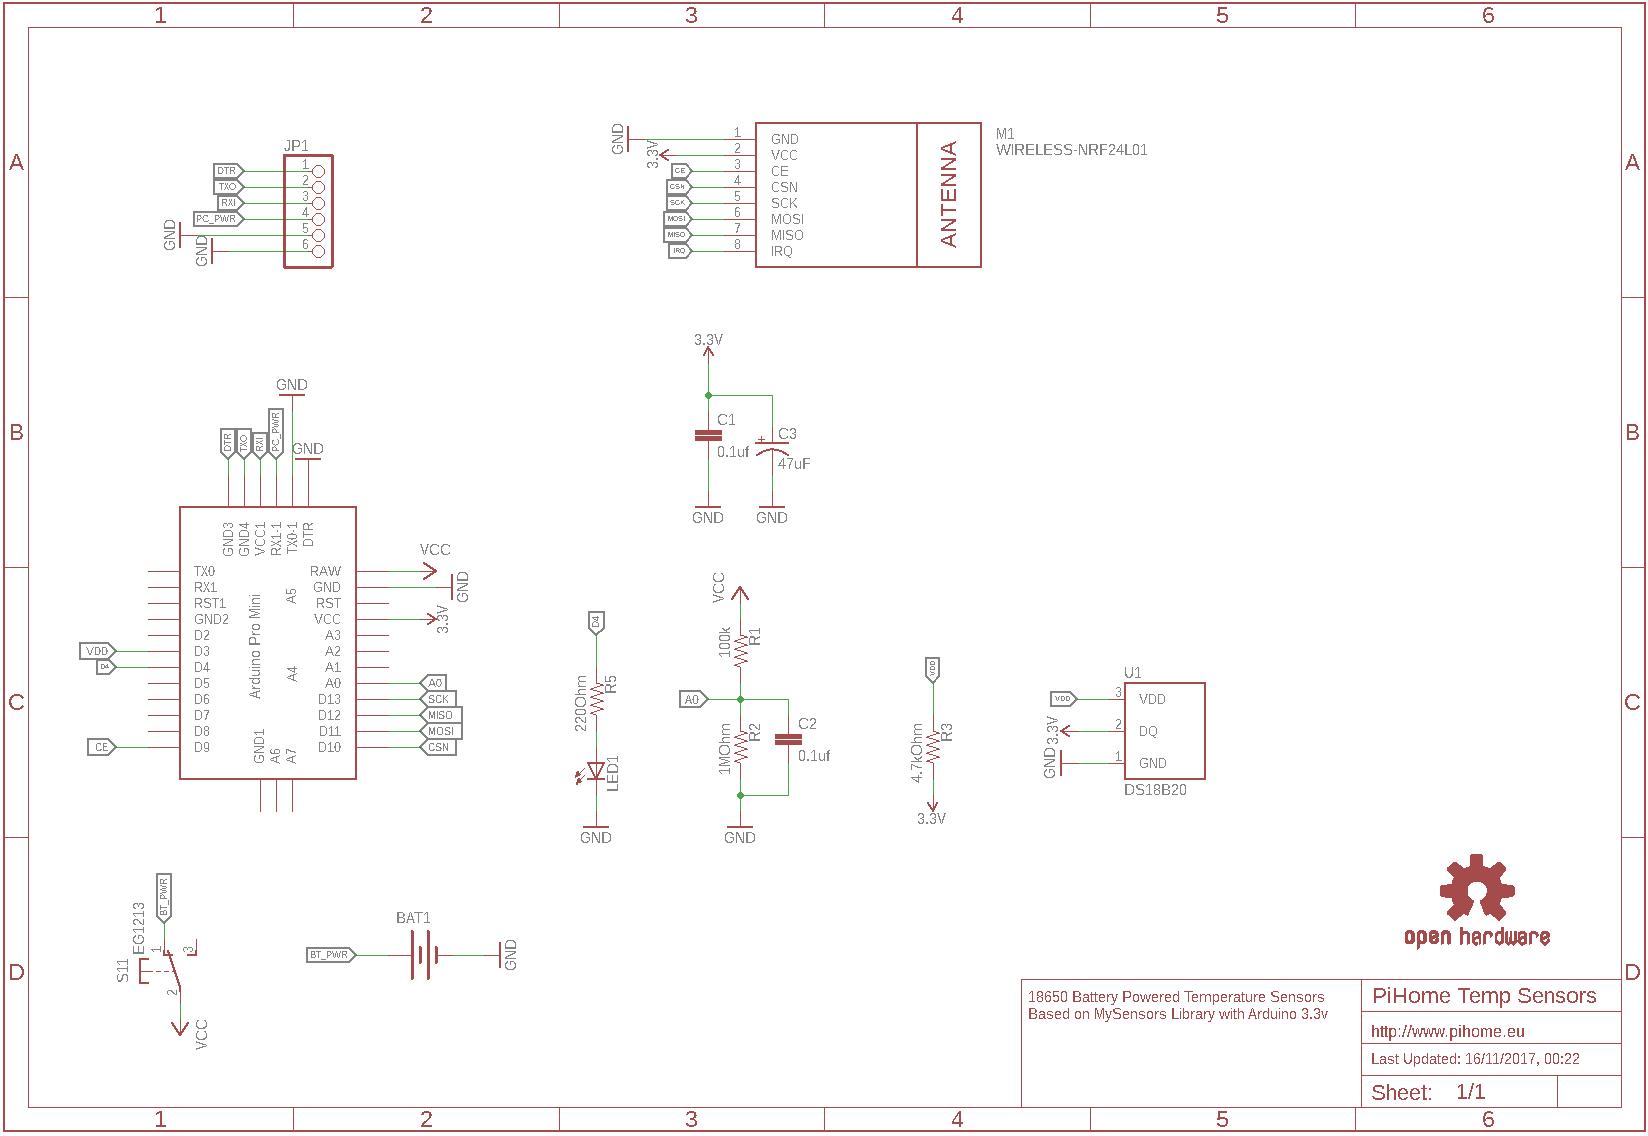 Battery Powered Arduino DS18B20 Temperature Sensor - PiHome